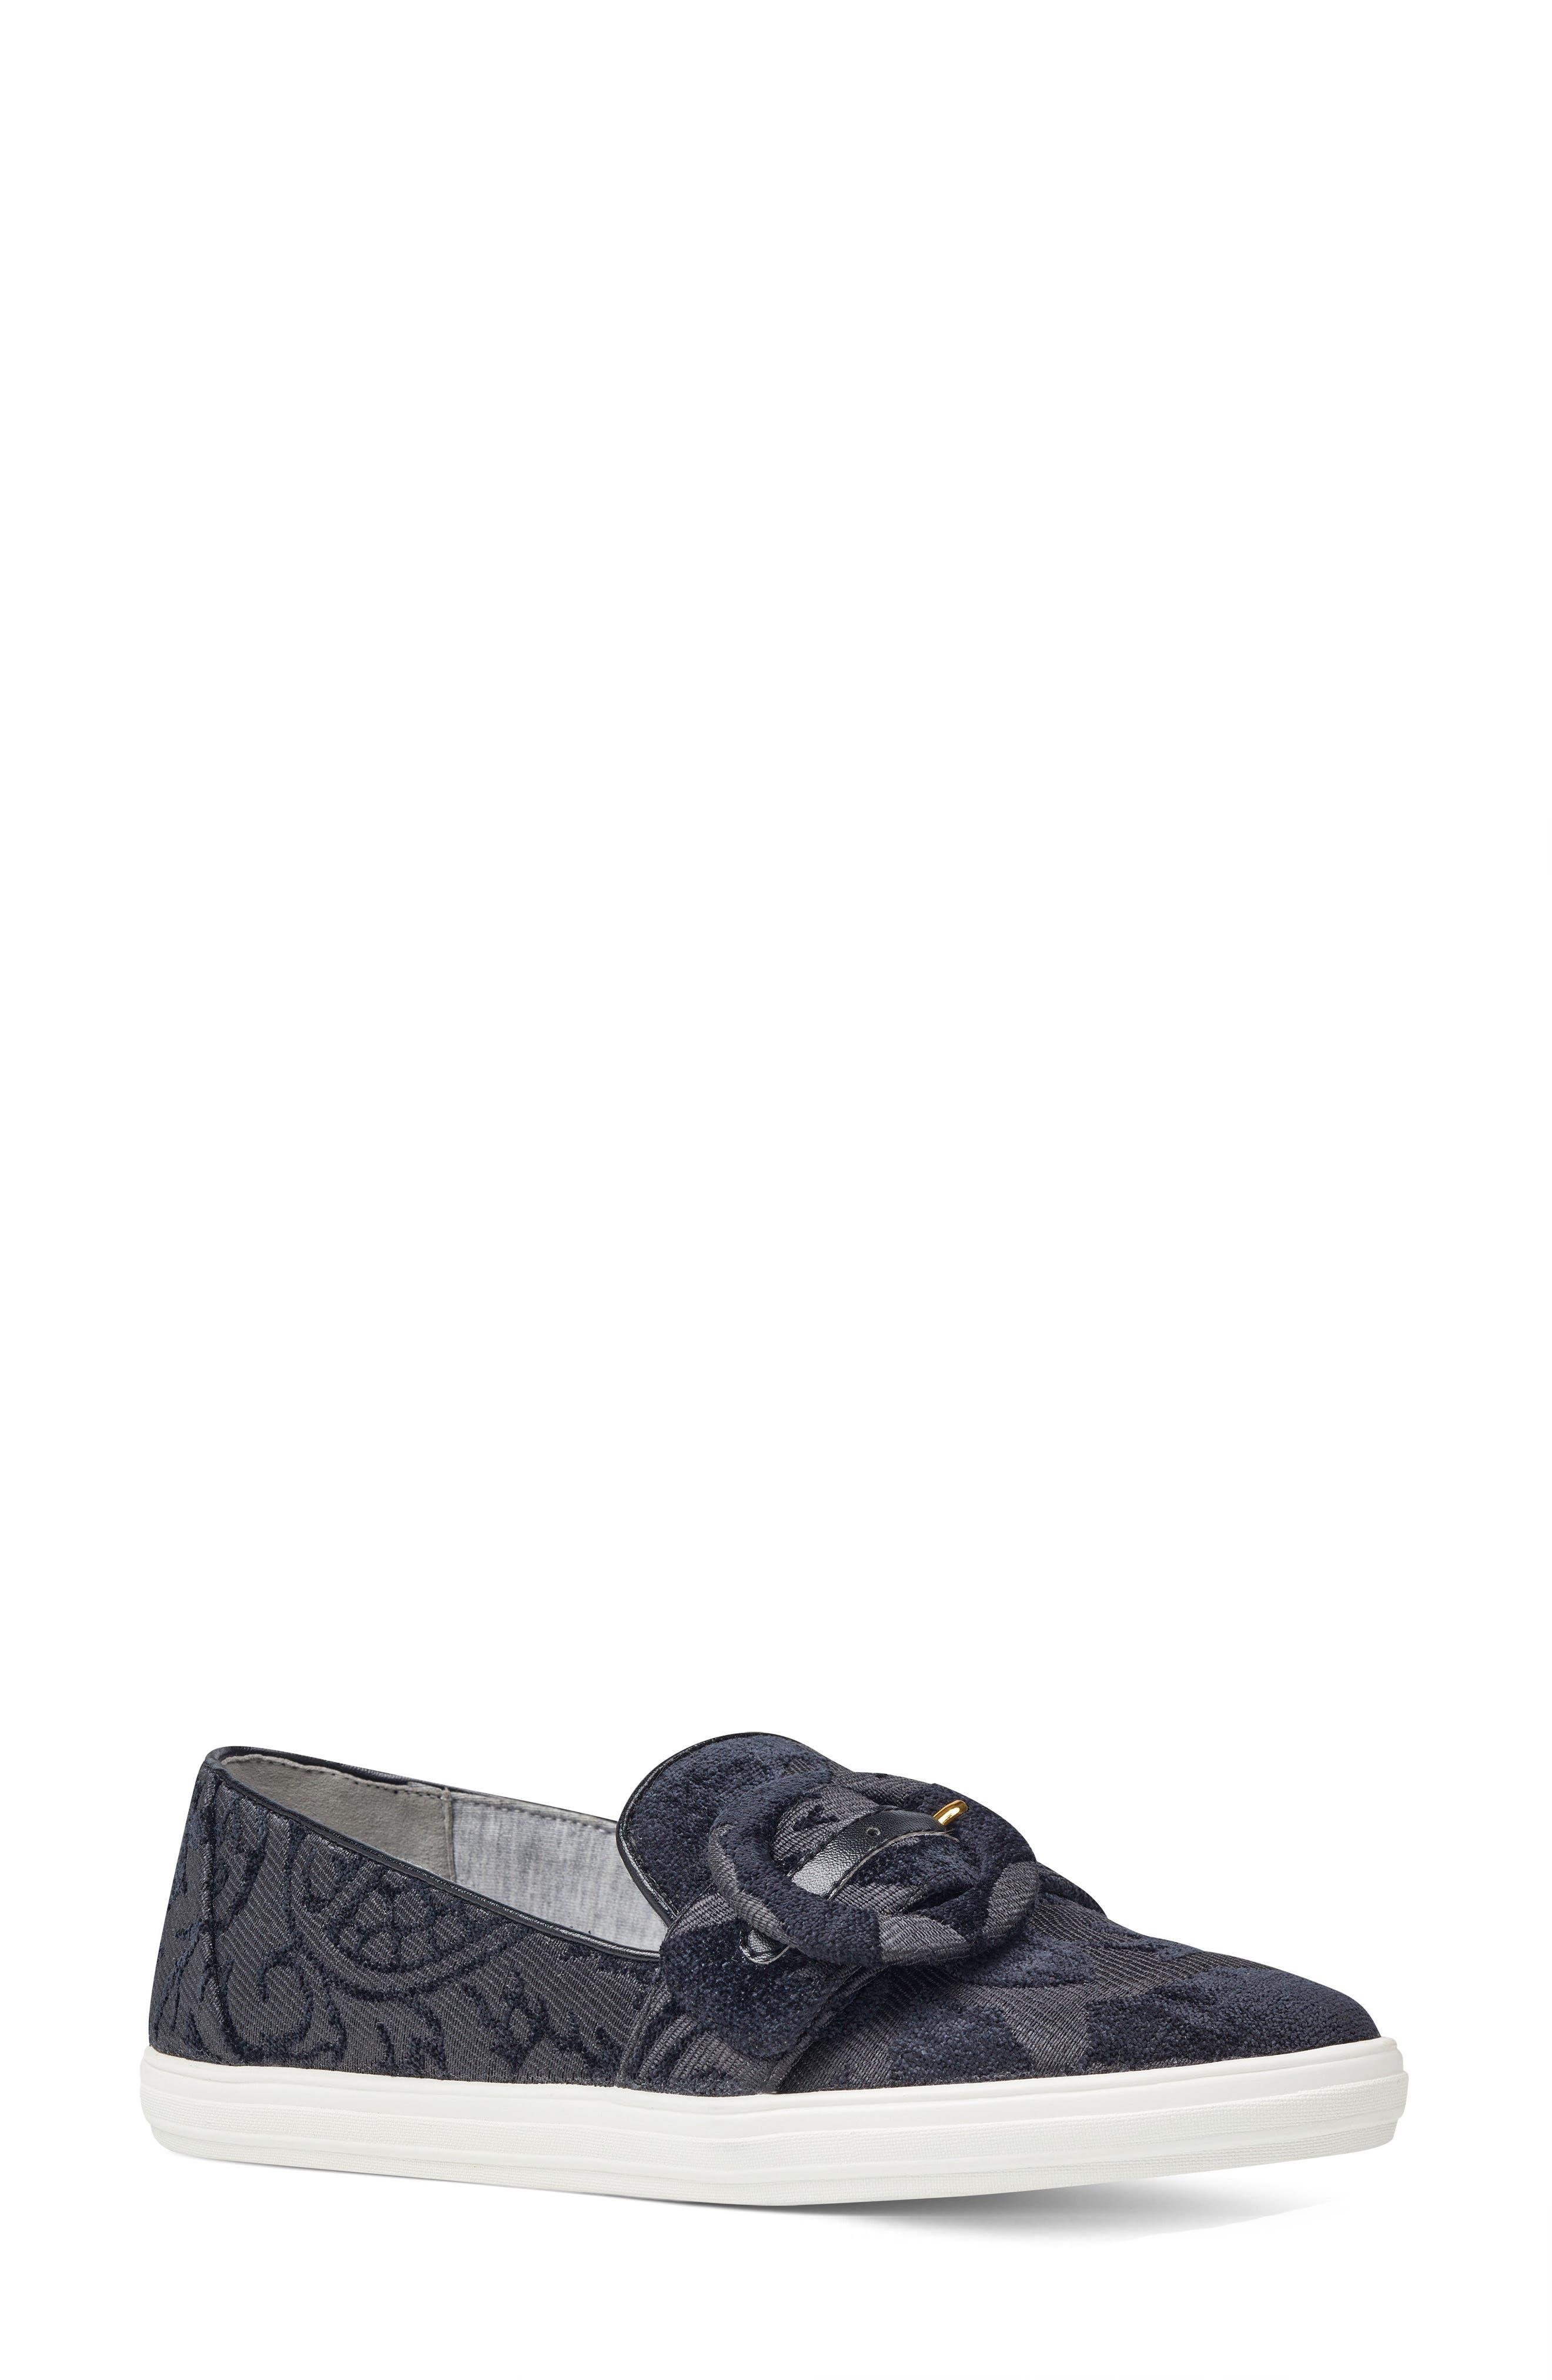 Shireene Slip-On Sneaker,                         Main,                         color, 002